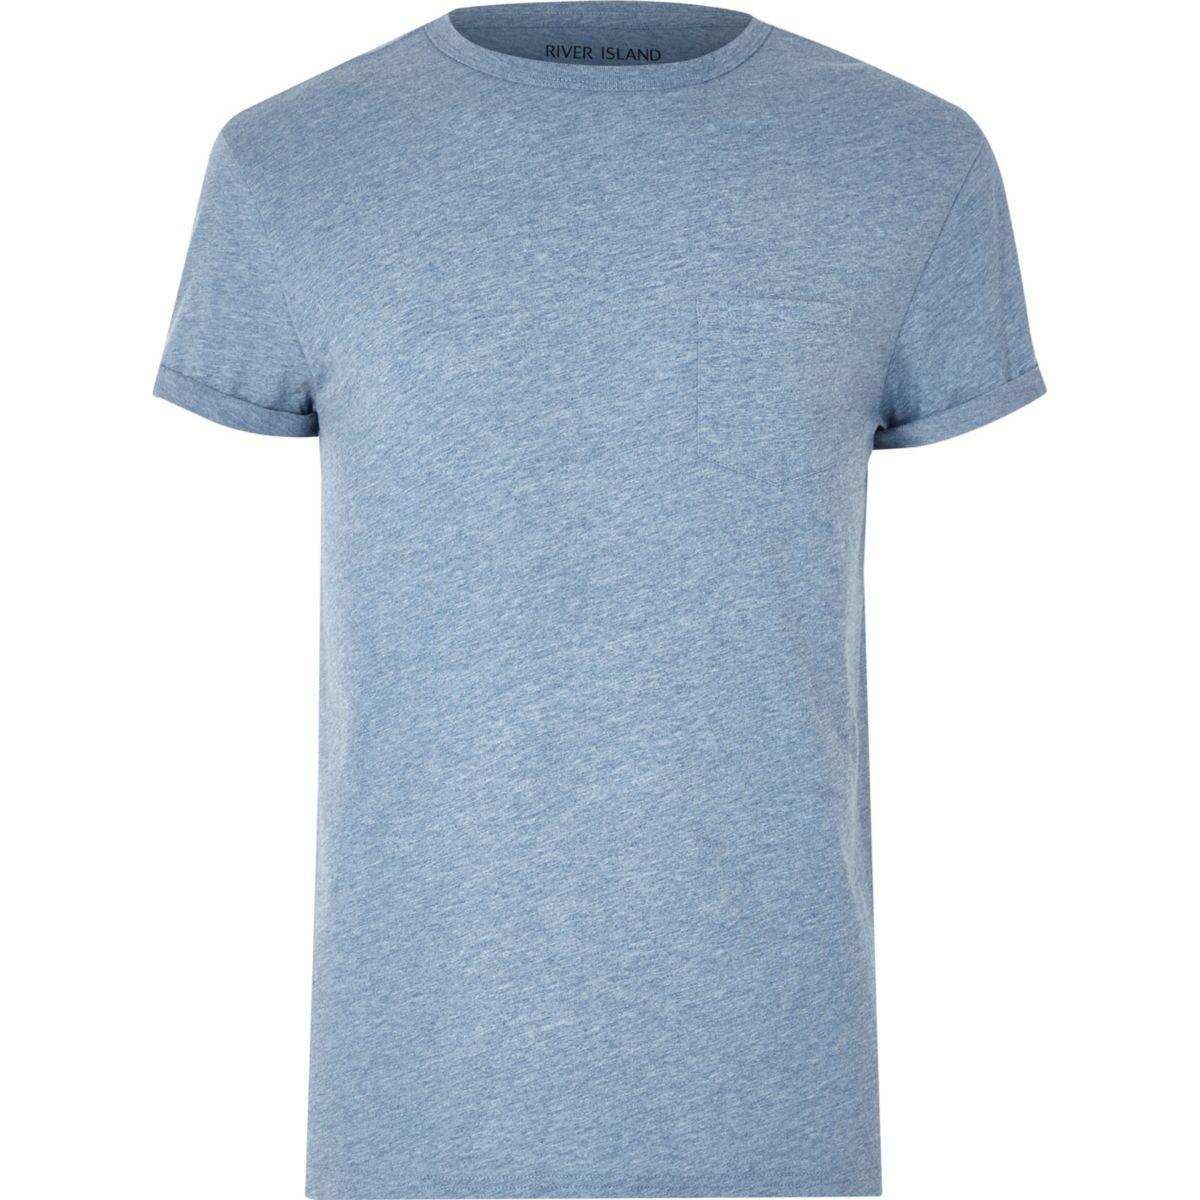 Blue marl pocket T-shirt